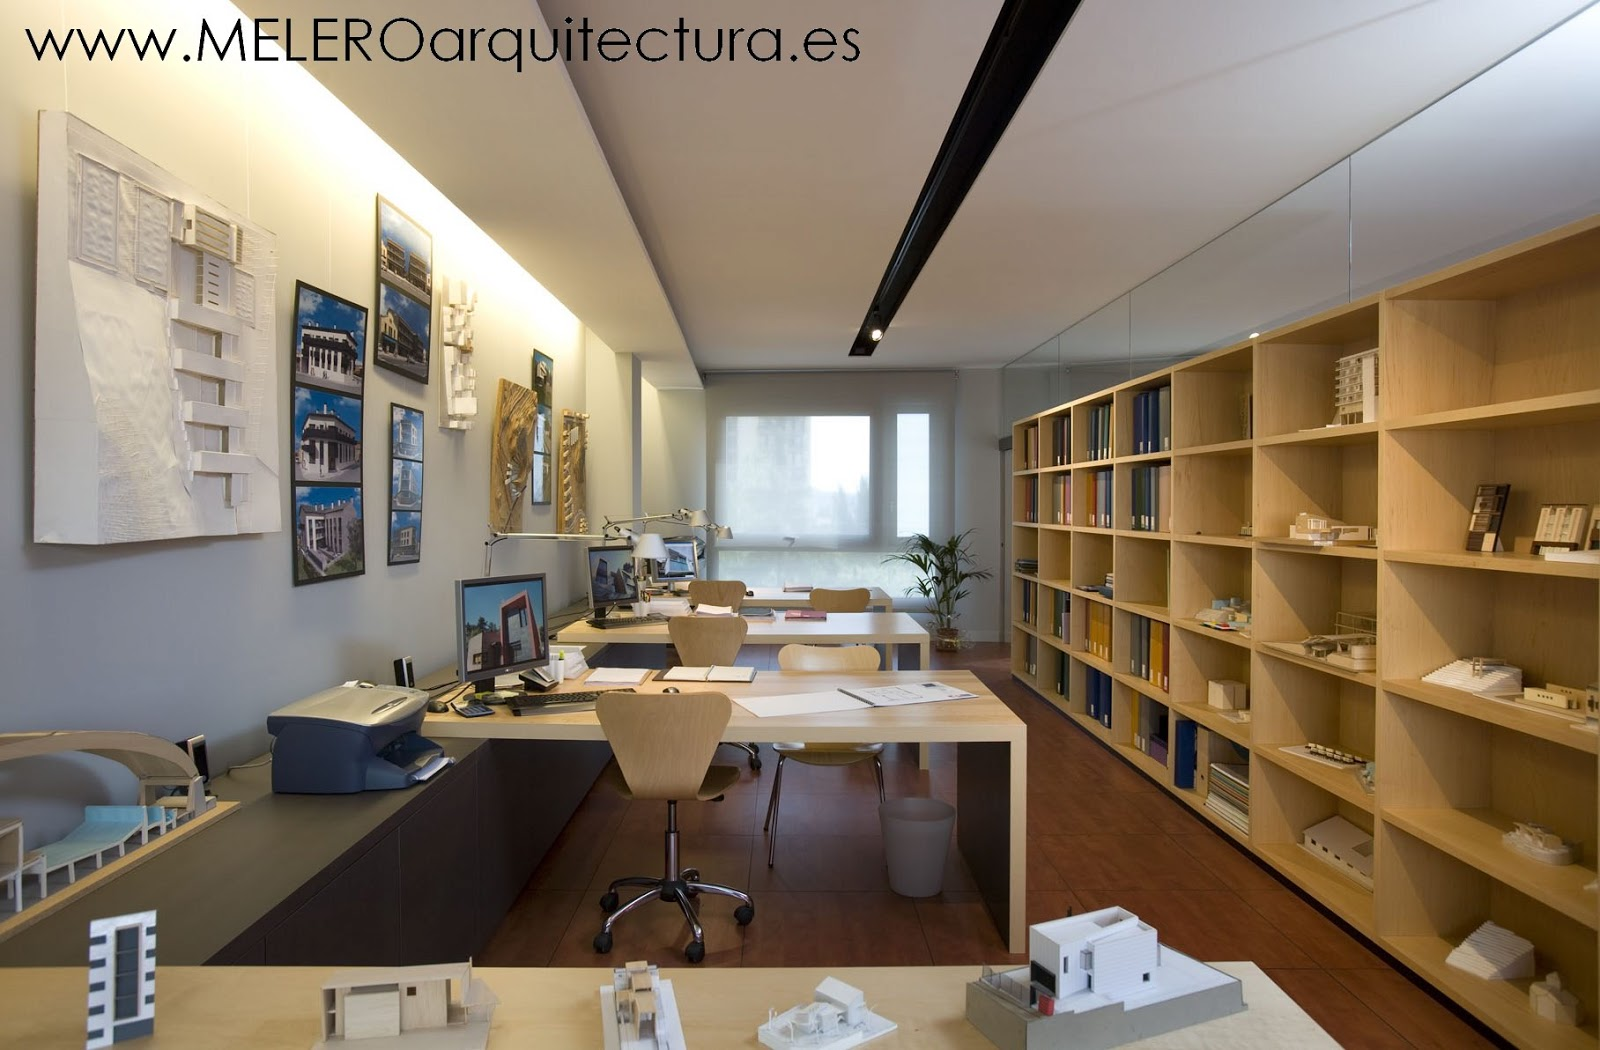 Melero arquitectura nuestra oficina i proyecto de - Despacho arquitectura barcelona ...